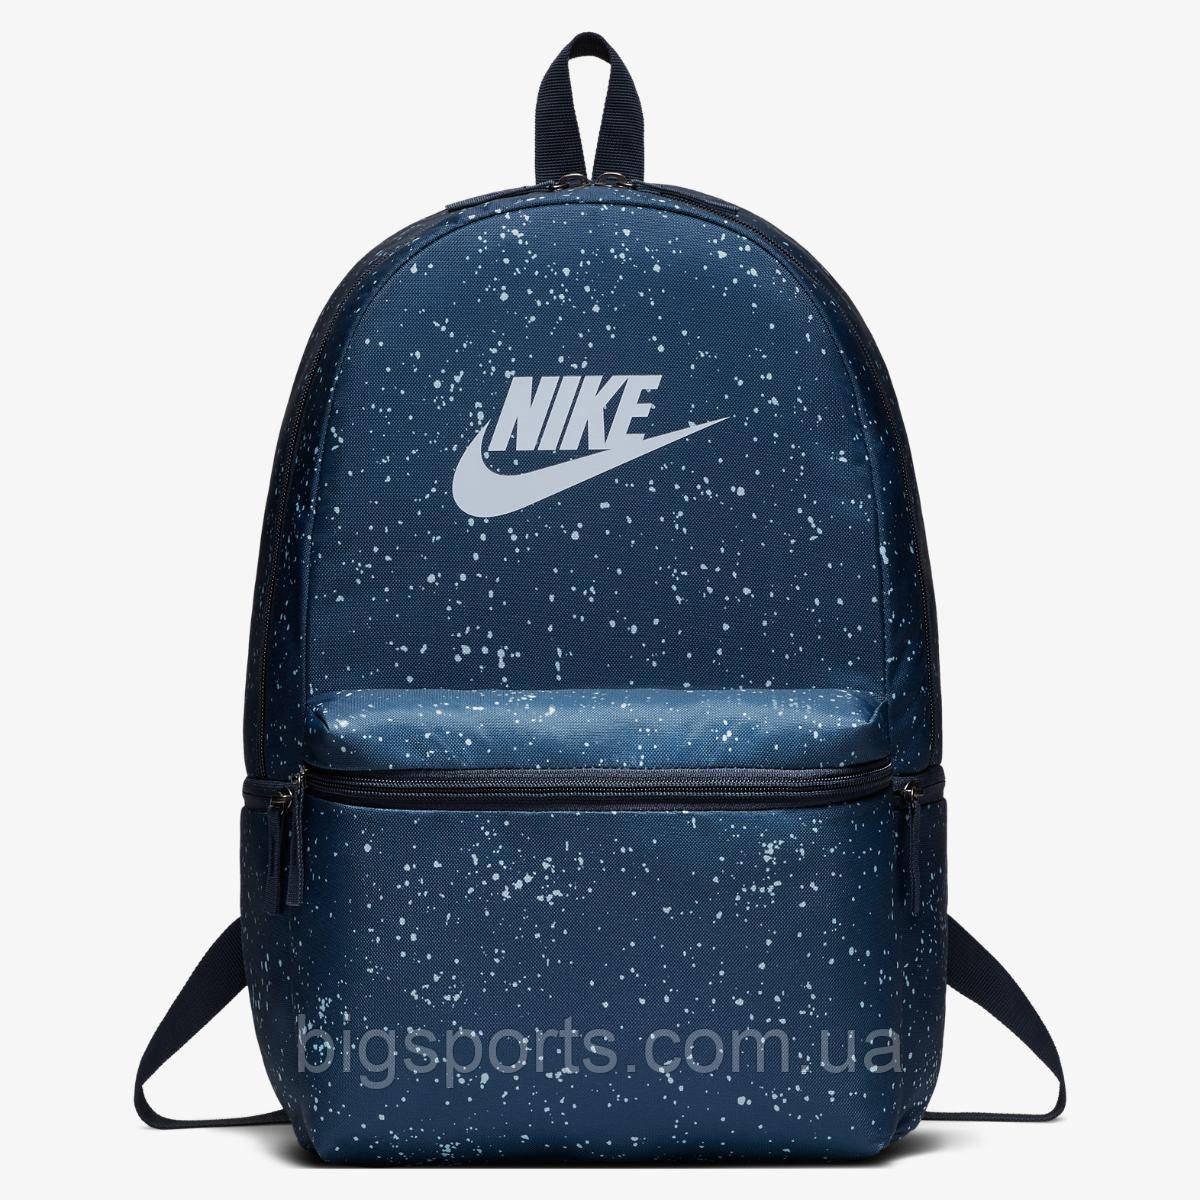 Рюкзак спортивный Nike Sportsware Heritage (арт. BA5761-471)